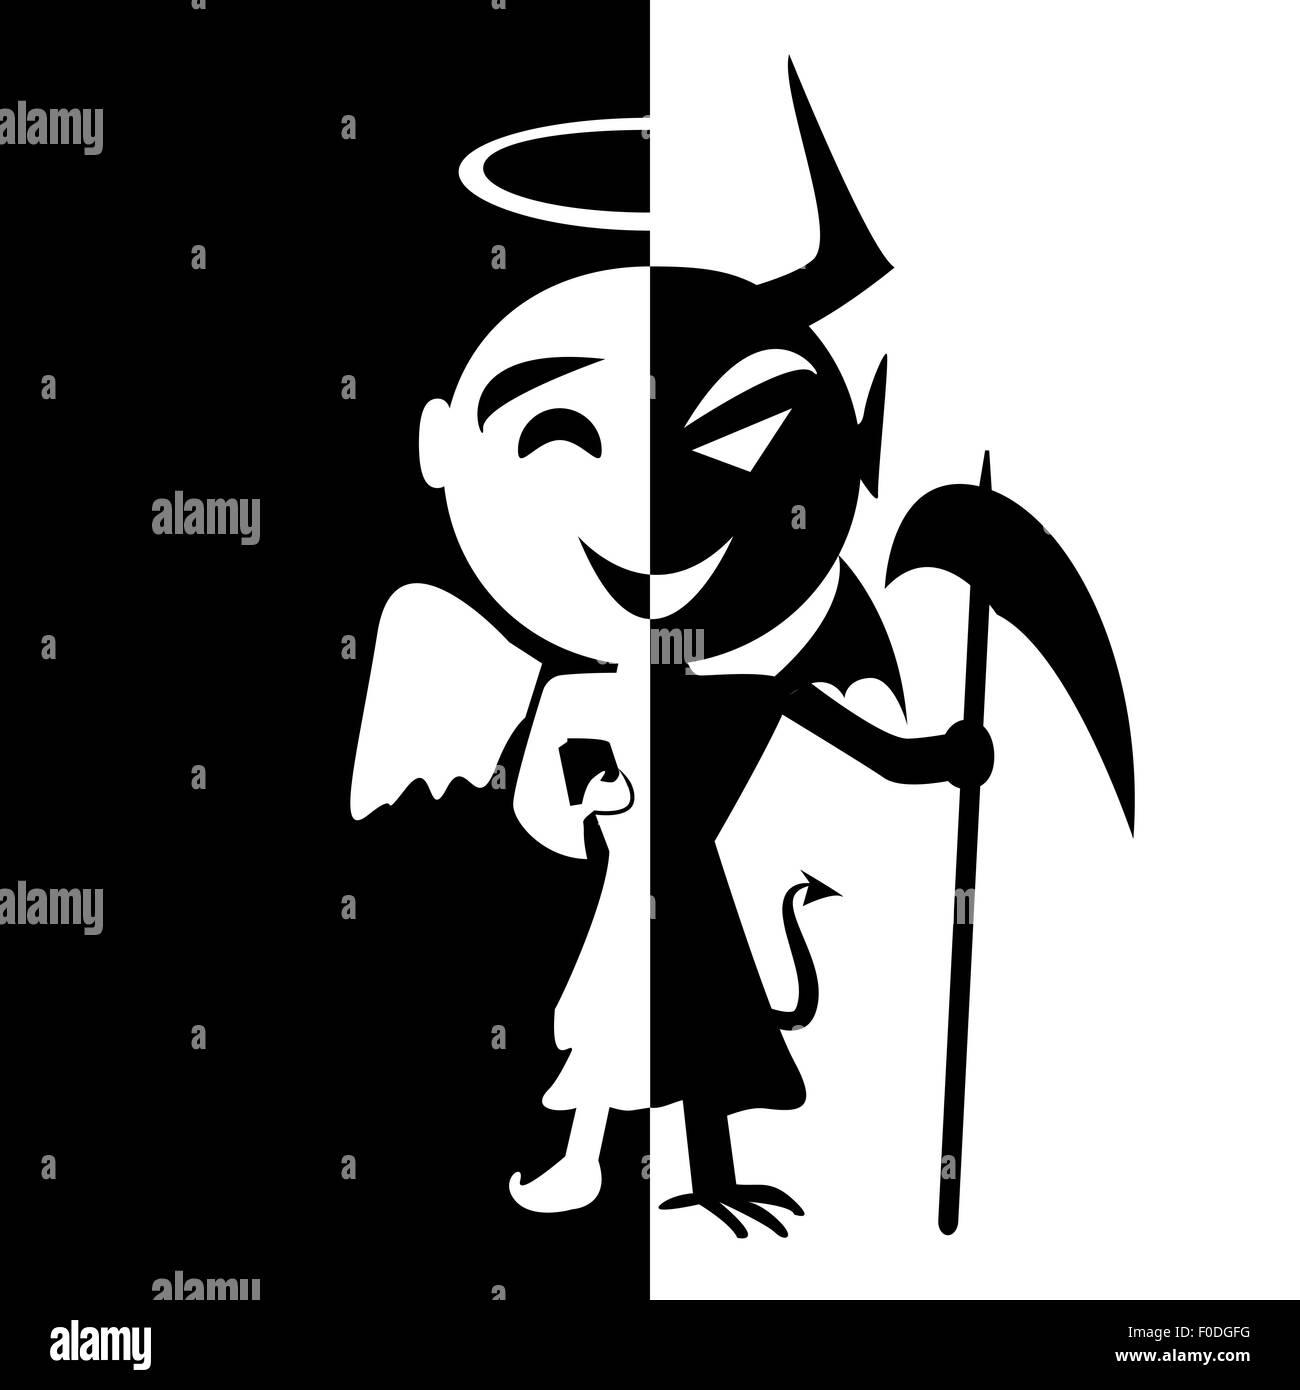 Bipolar disorderile of saint and satan angel and devil in same bipolar disorderile of saint and satan angel and devil in same person good or evilfake man biocorpaavc Gallery